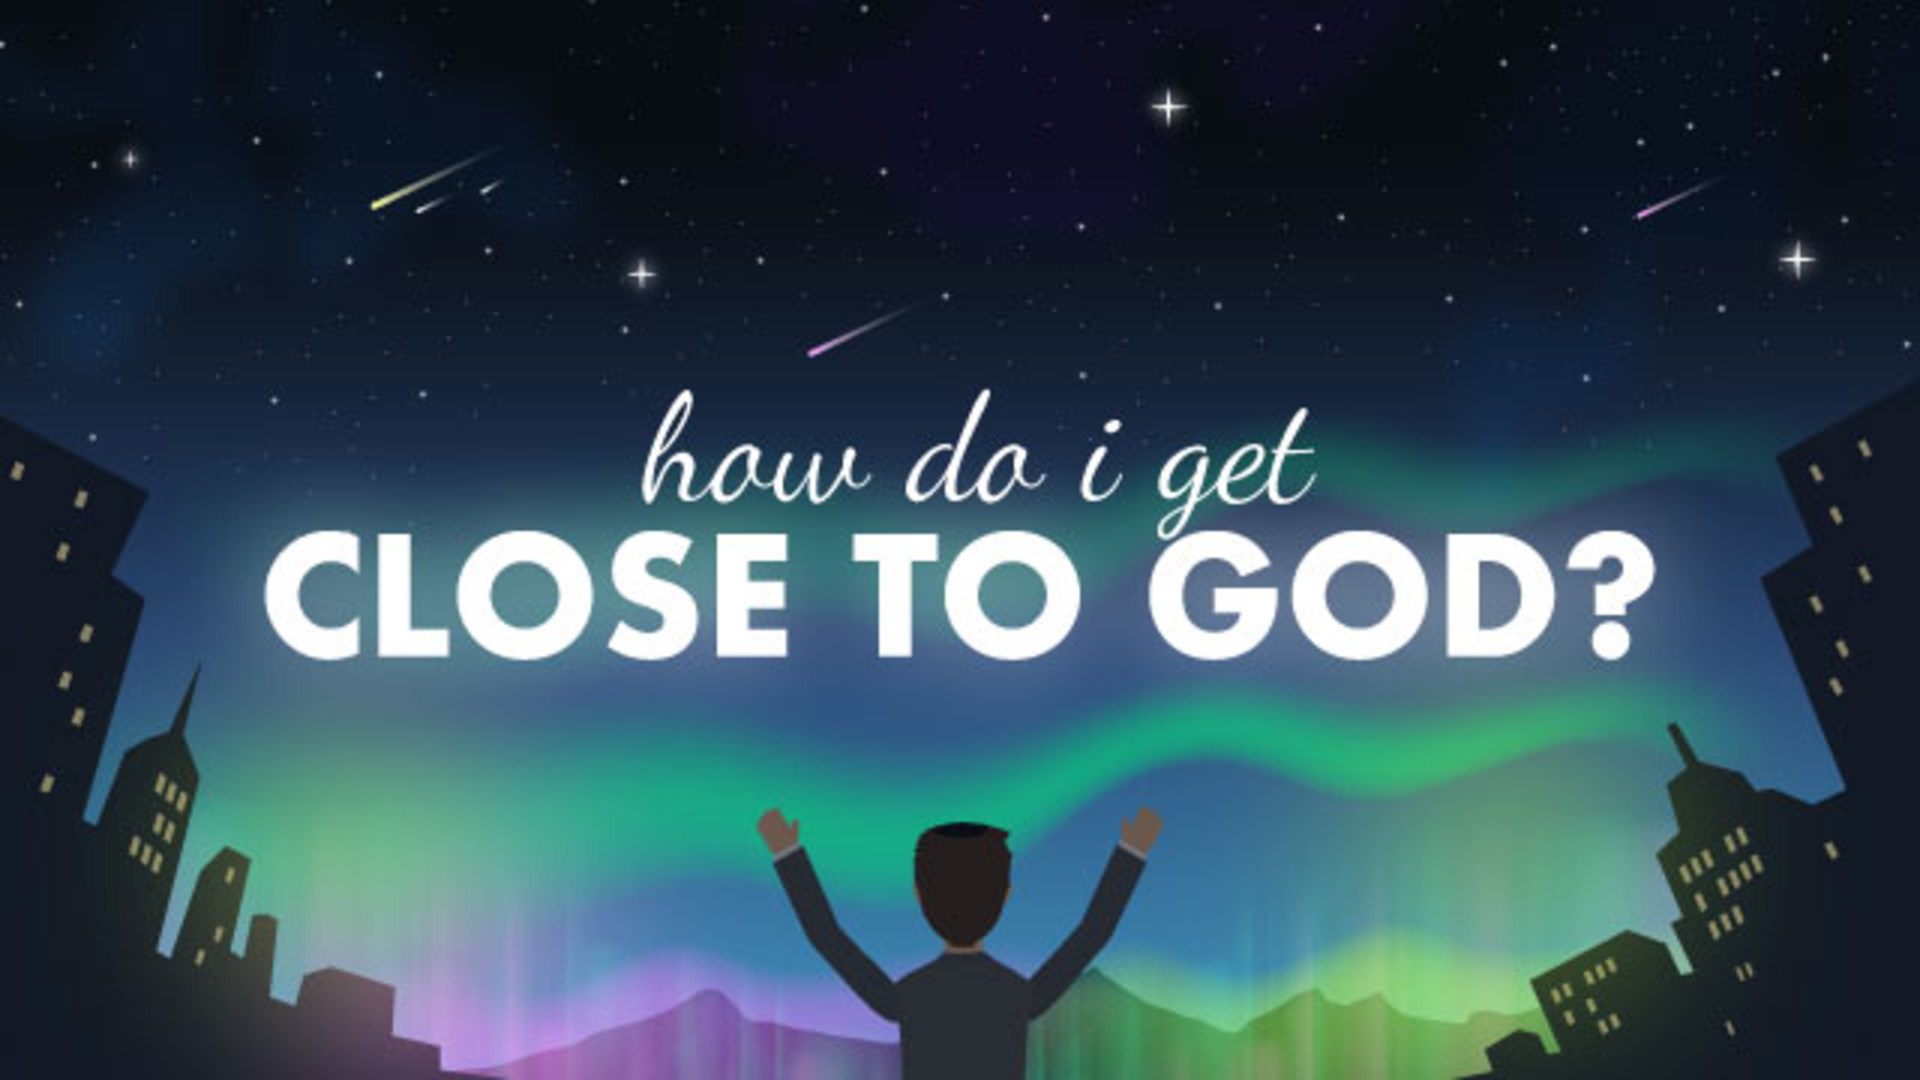 Hannah prayer meaning closer to God